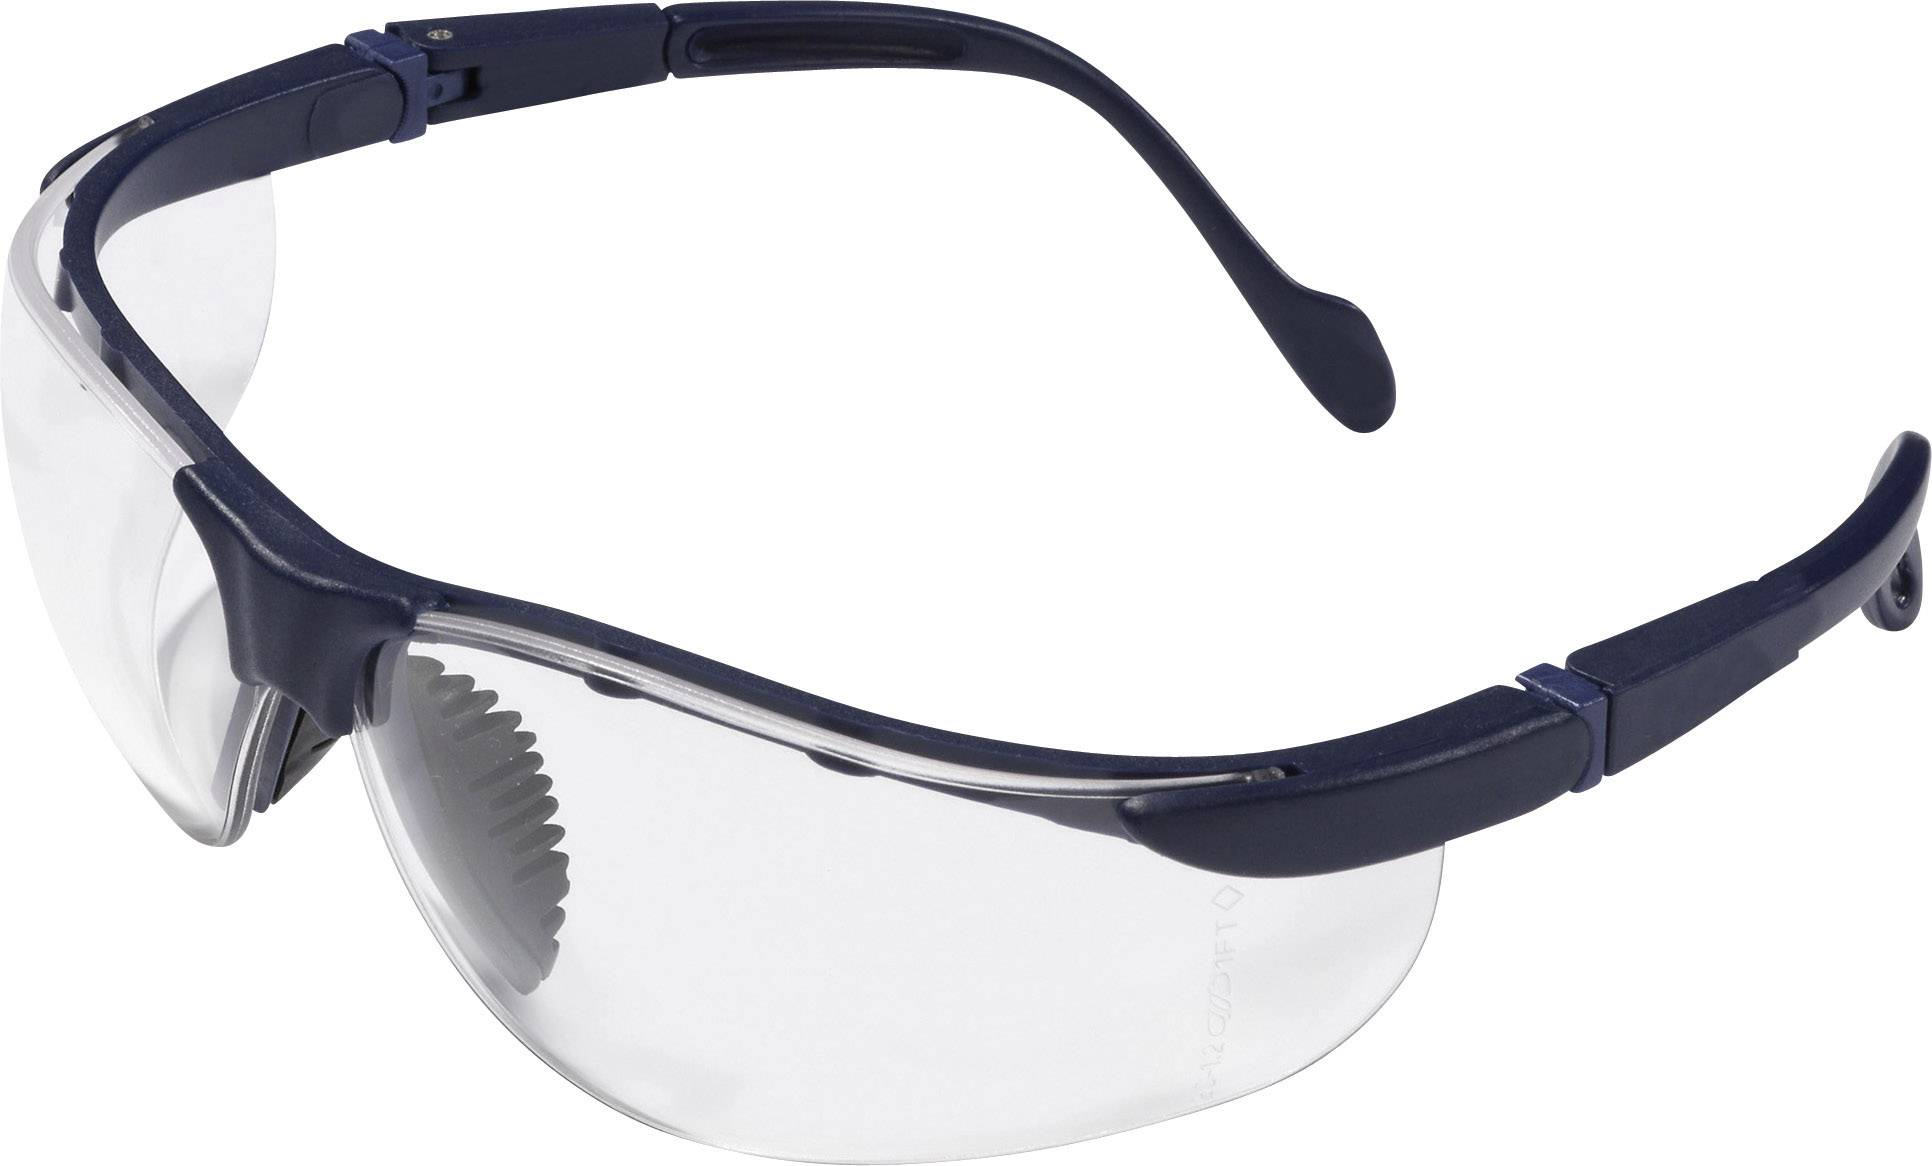 Ochranné okuliare protectionworld 2012006